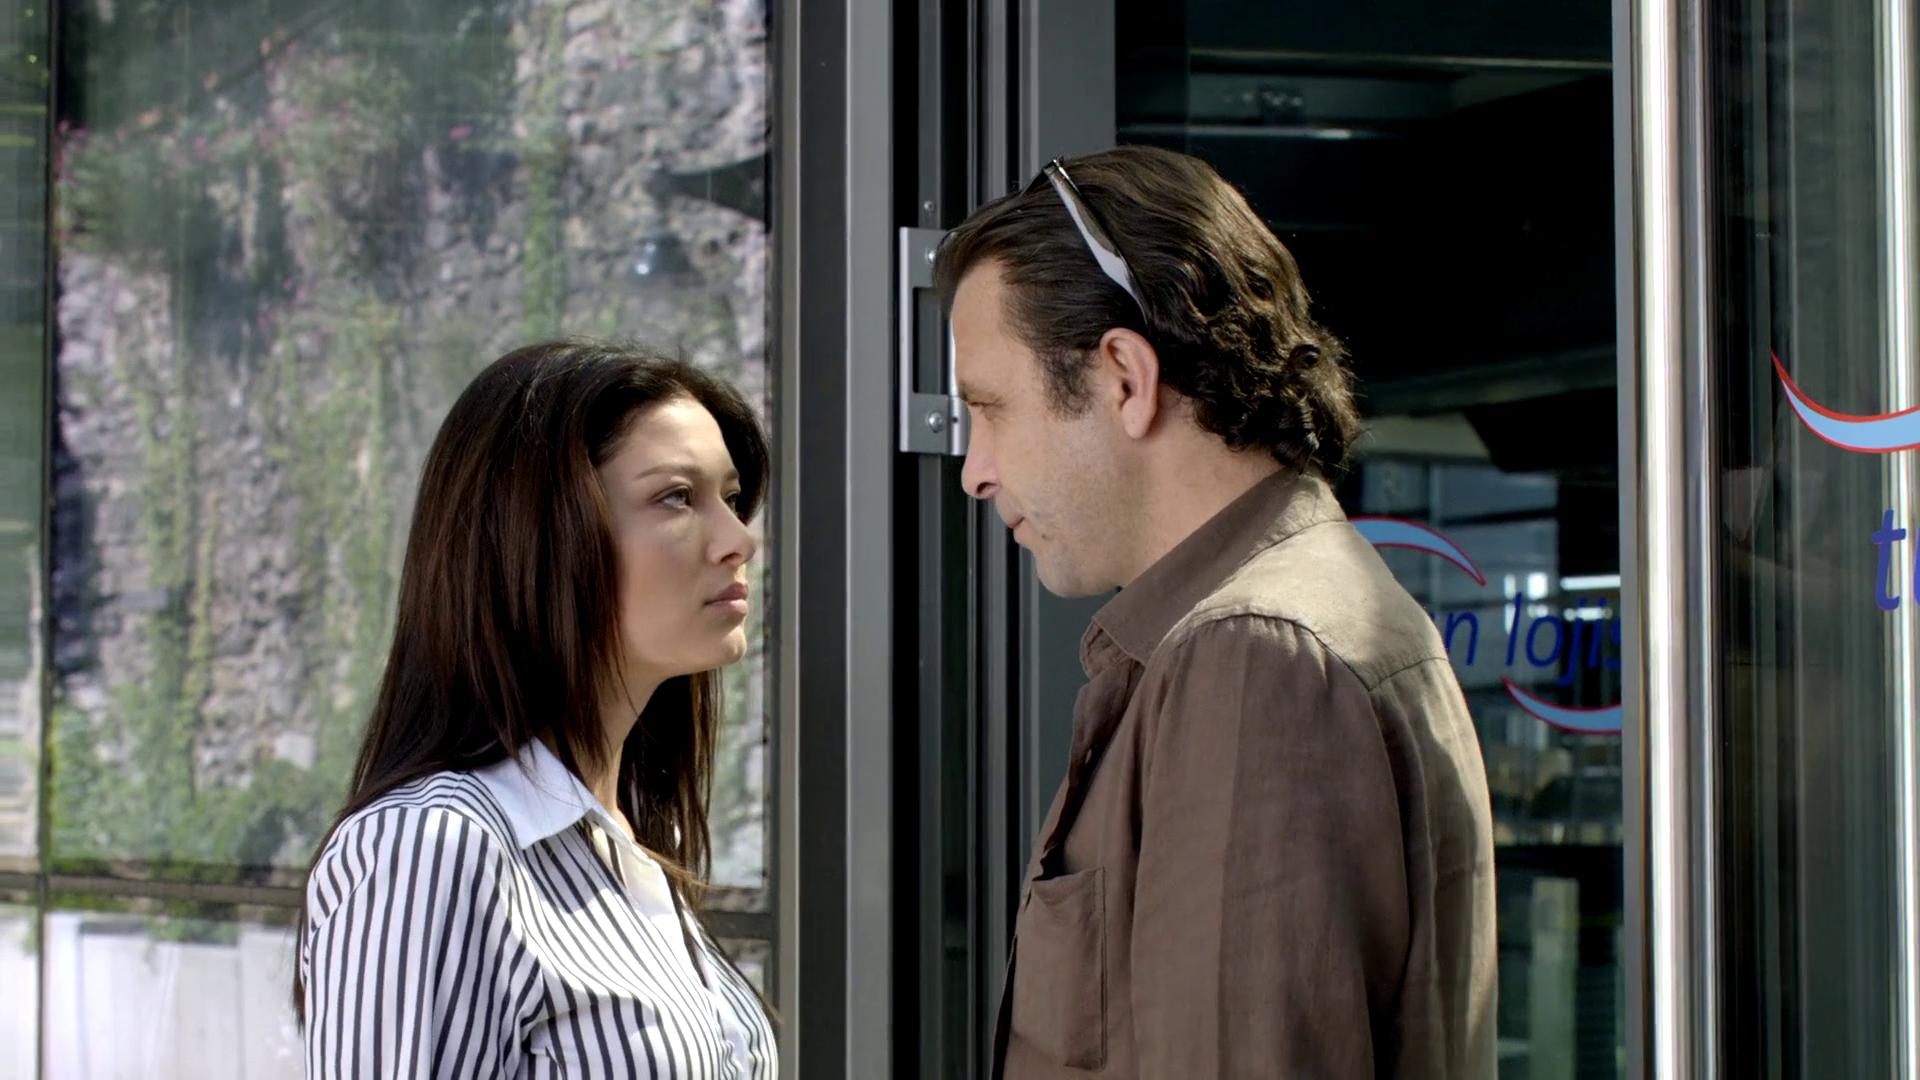 Çınar Ağacı   2011   Yerli Film   NF   WEB-DL   XviD   Sansürsüz   1080p - m720p - m1080p   WEB-DL   Tek Link